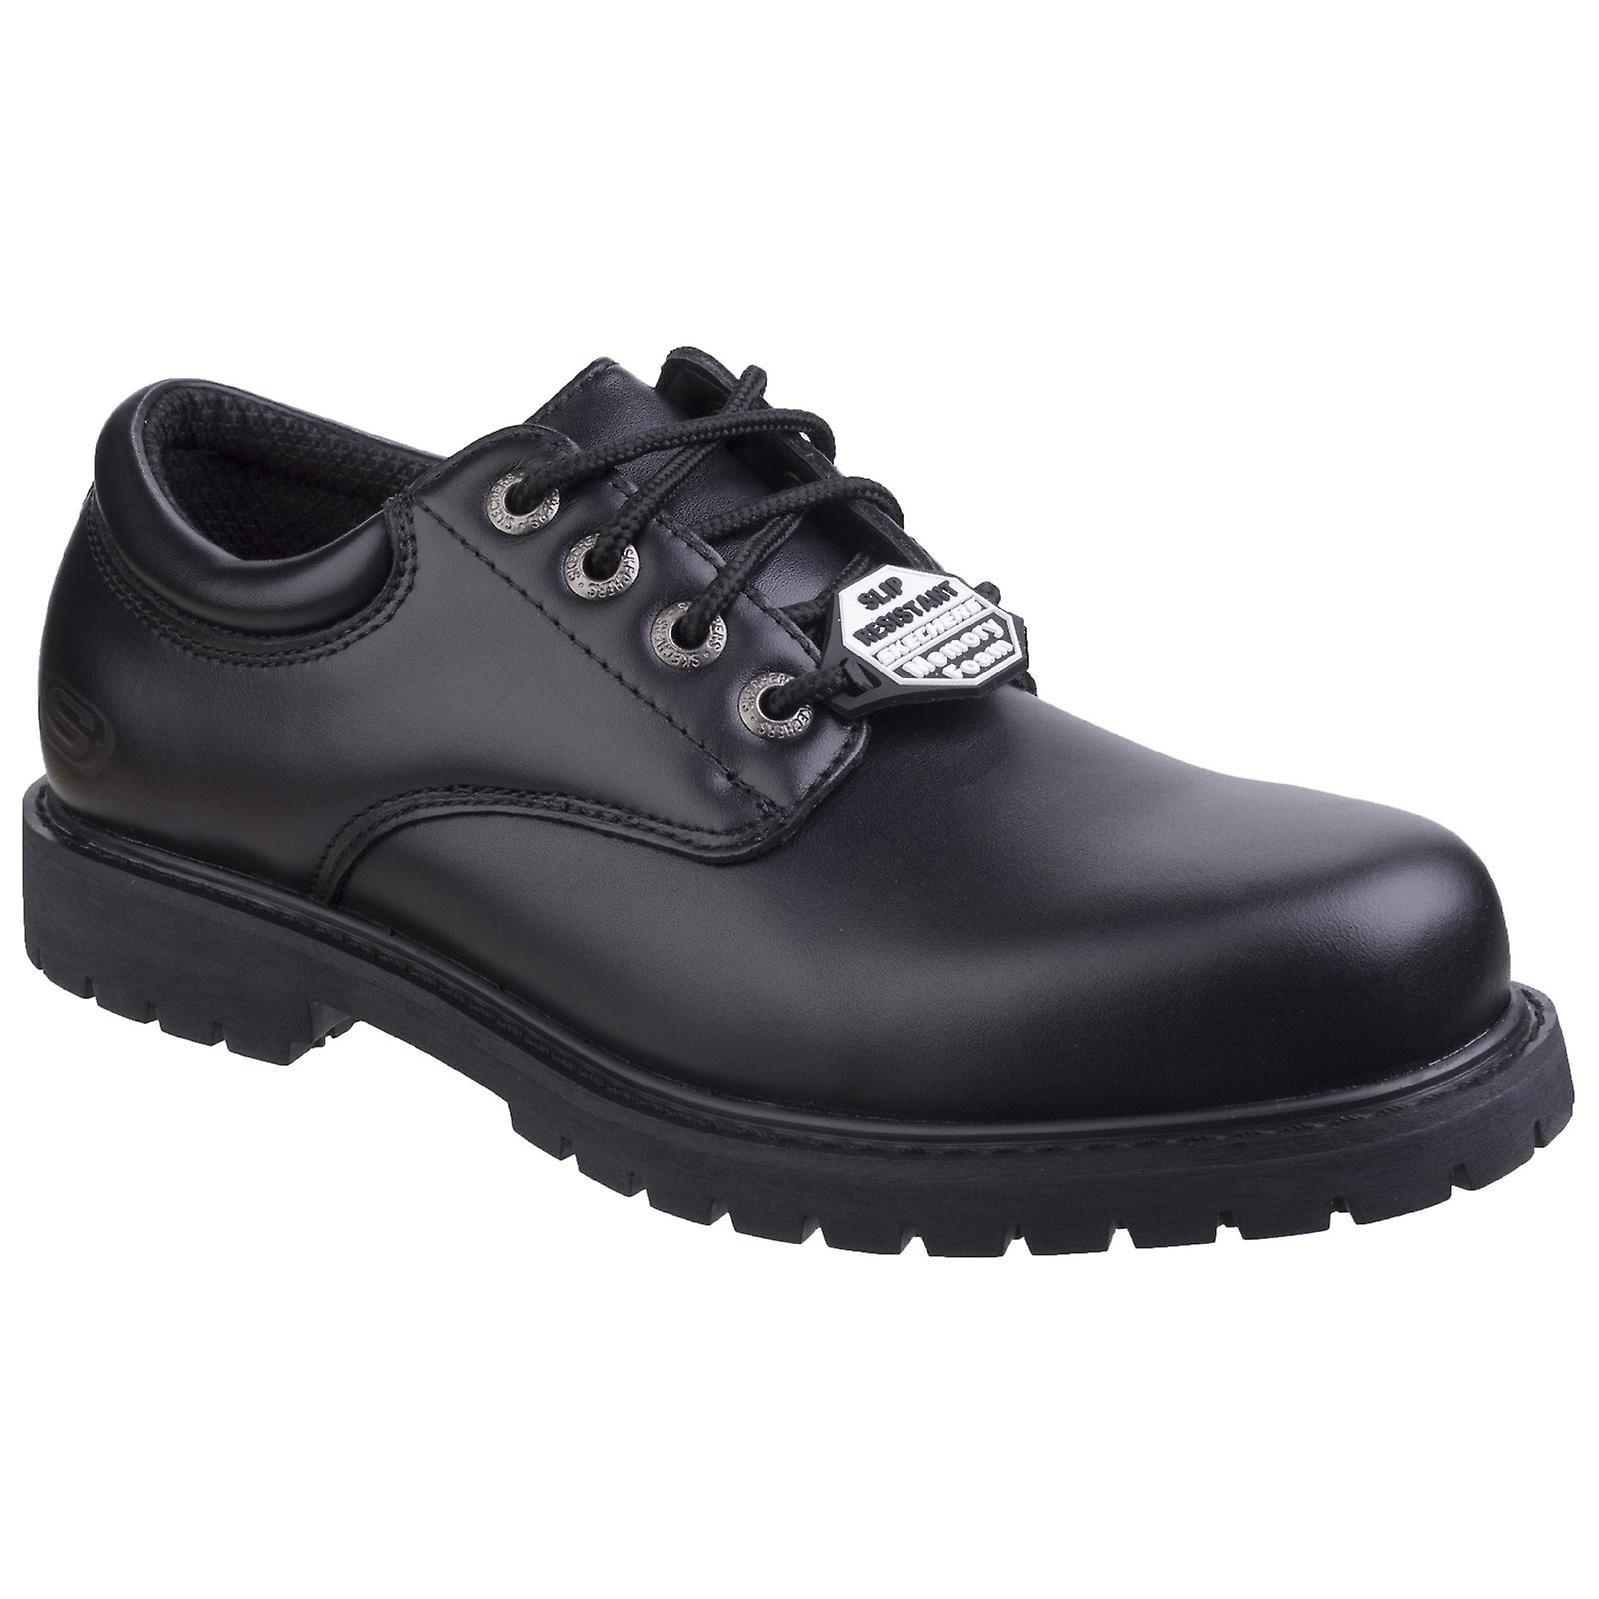 Shoes SR Skechers Cottonwood Mens Elks Rq7FRO6f